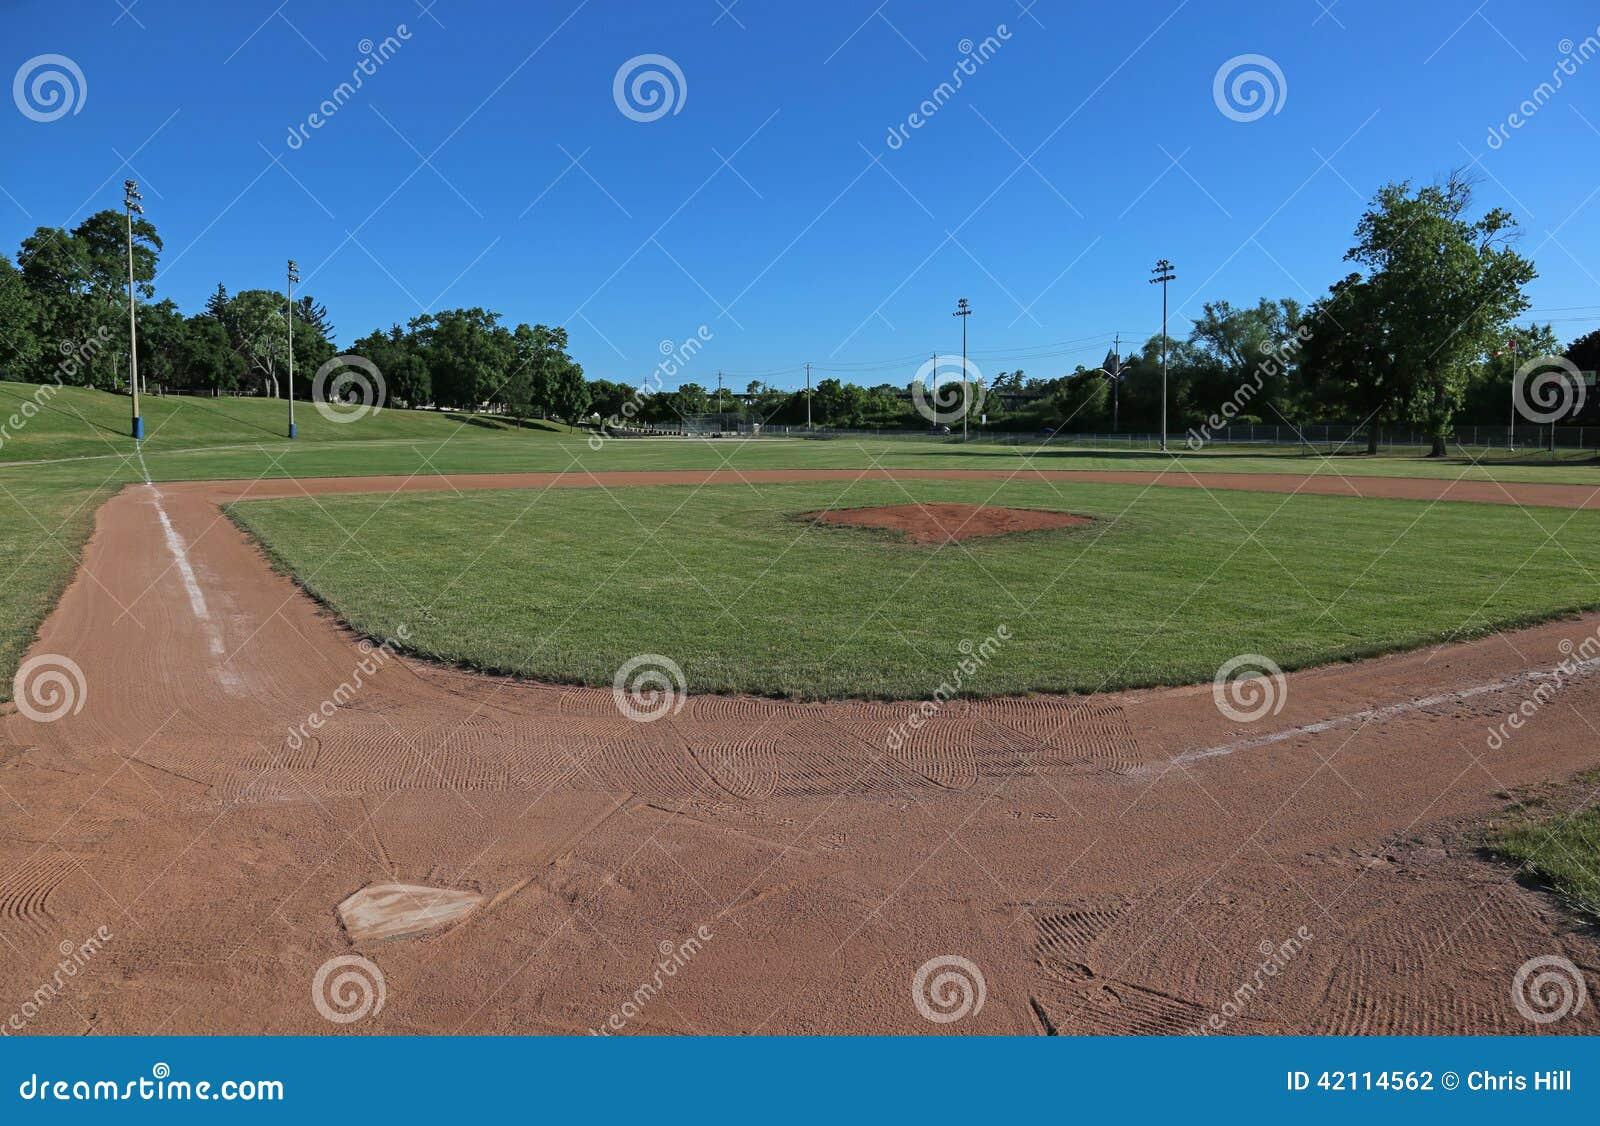 Terrain de base-ball grand-angulaire